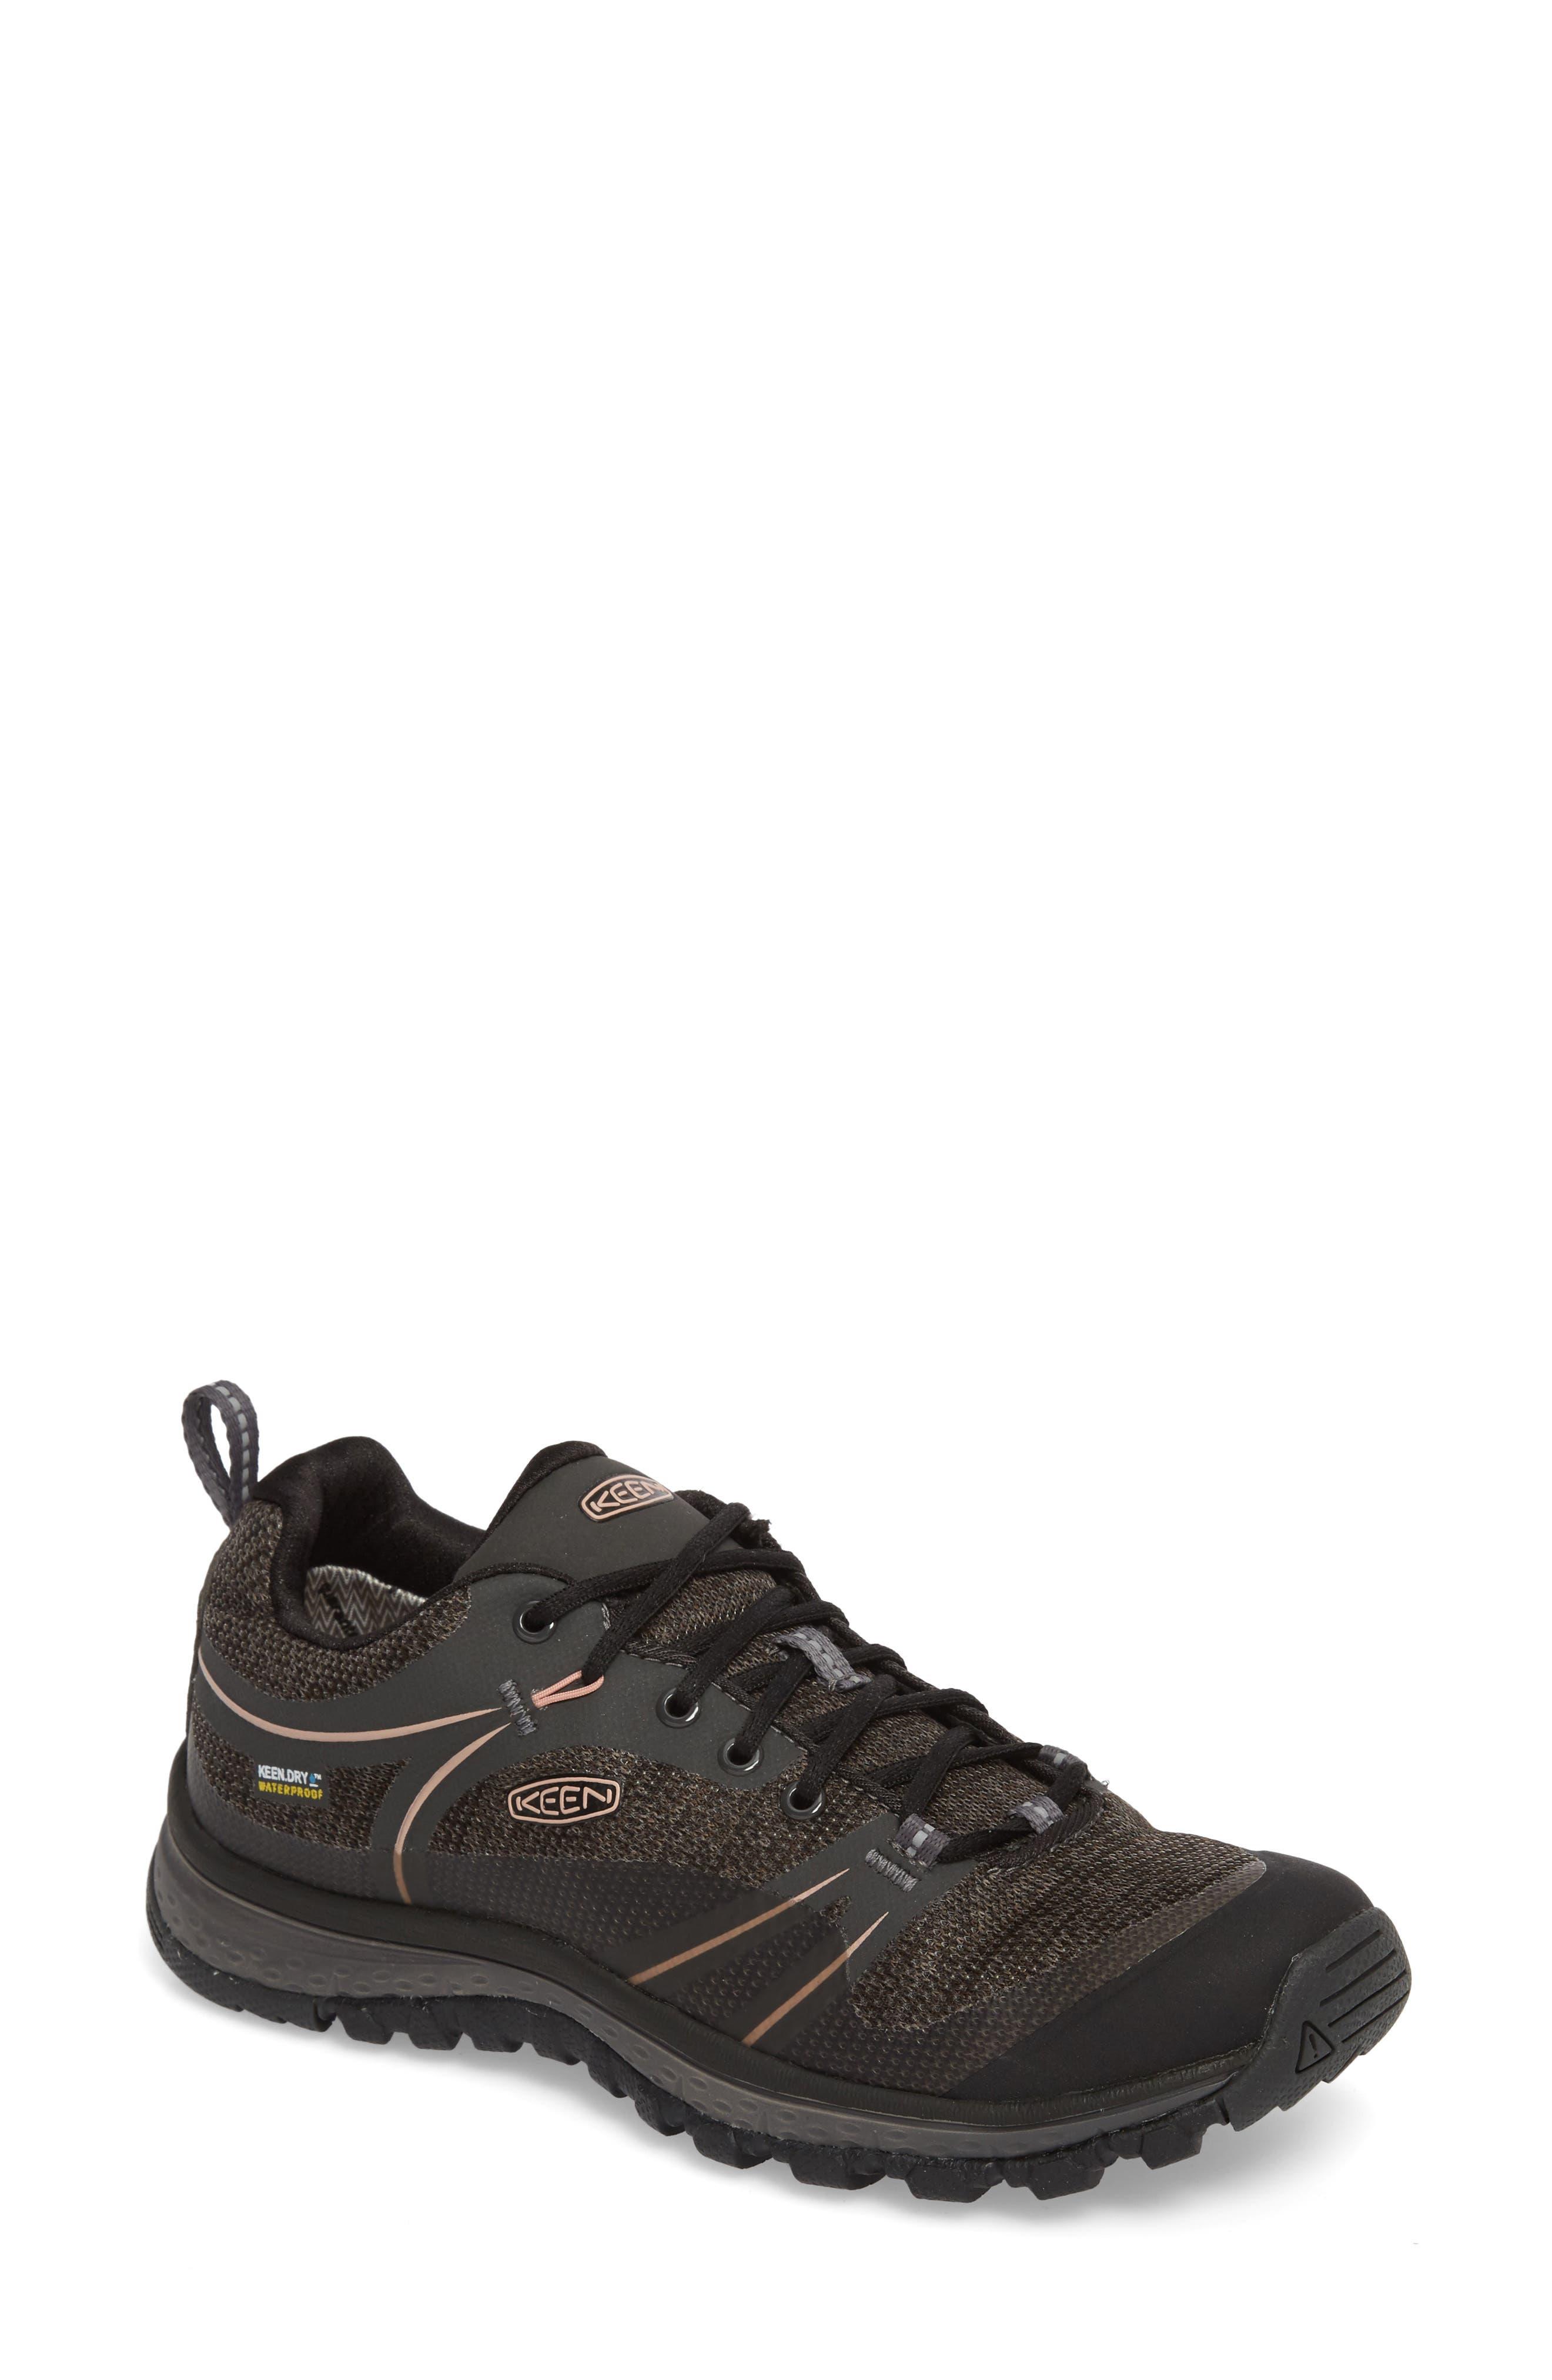 Terradora Waterproof Hiking Shoe,                         Main,                         color, RAVEN/ ROSE DAWN